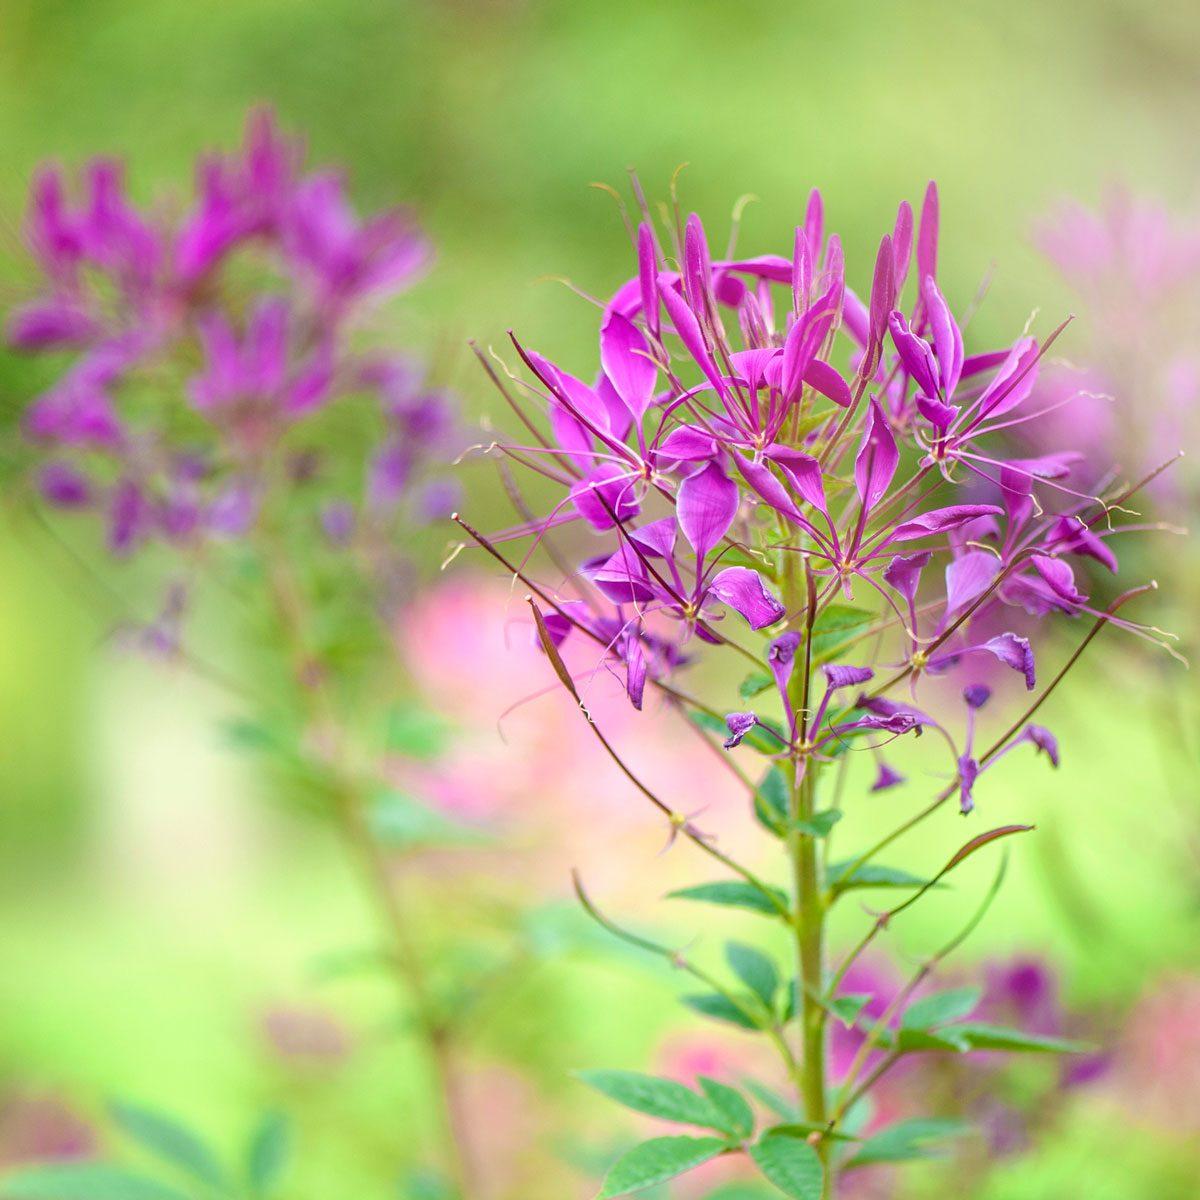 spider flower, Cleome hassleriana